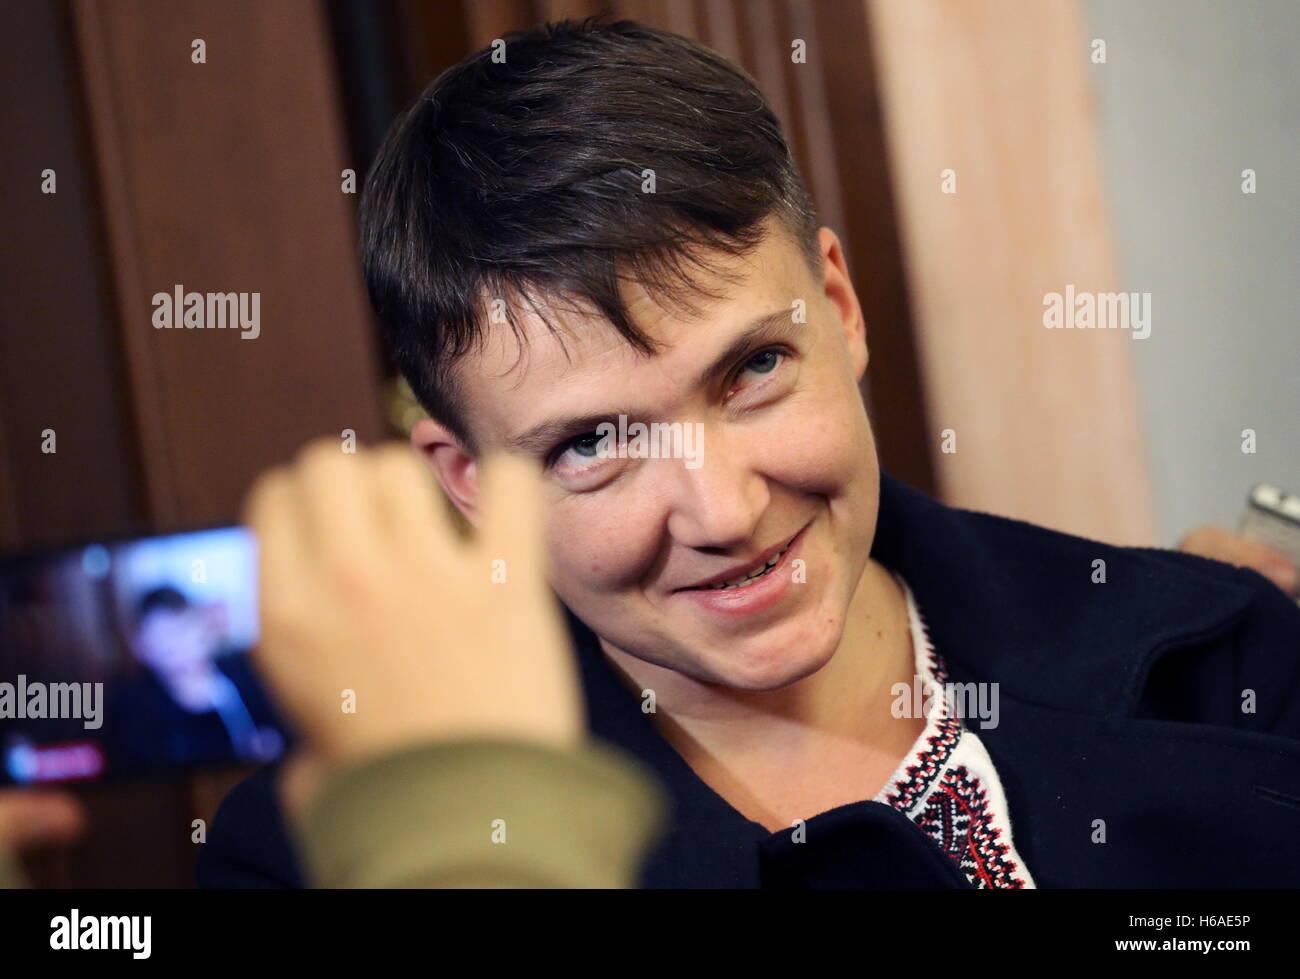 Moscow, Russia. 26th Oct, 2016. Ukraine's Verkhovna Rada member Nadezhda Savchenko attends Russia's Supreme Court Stock Photo